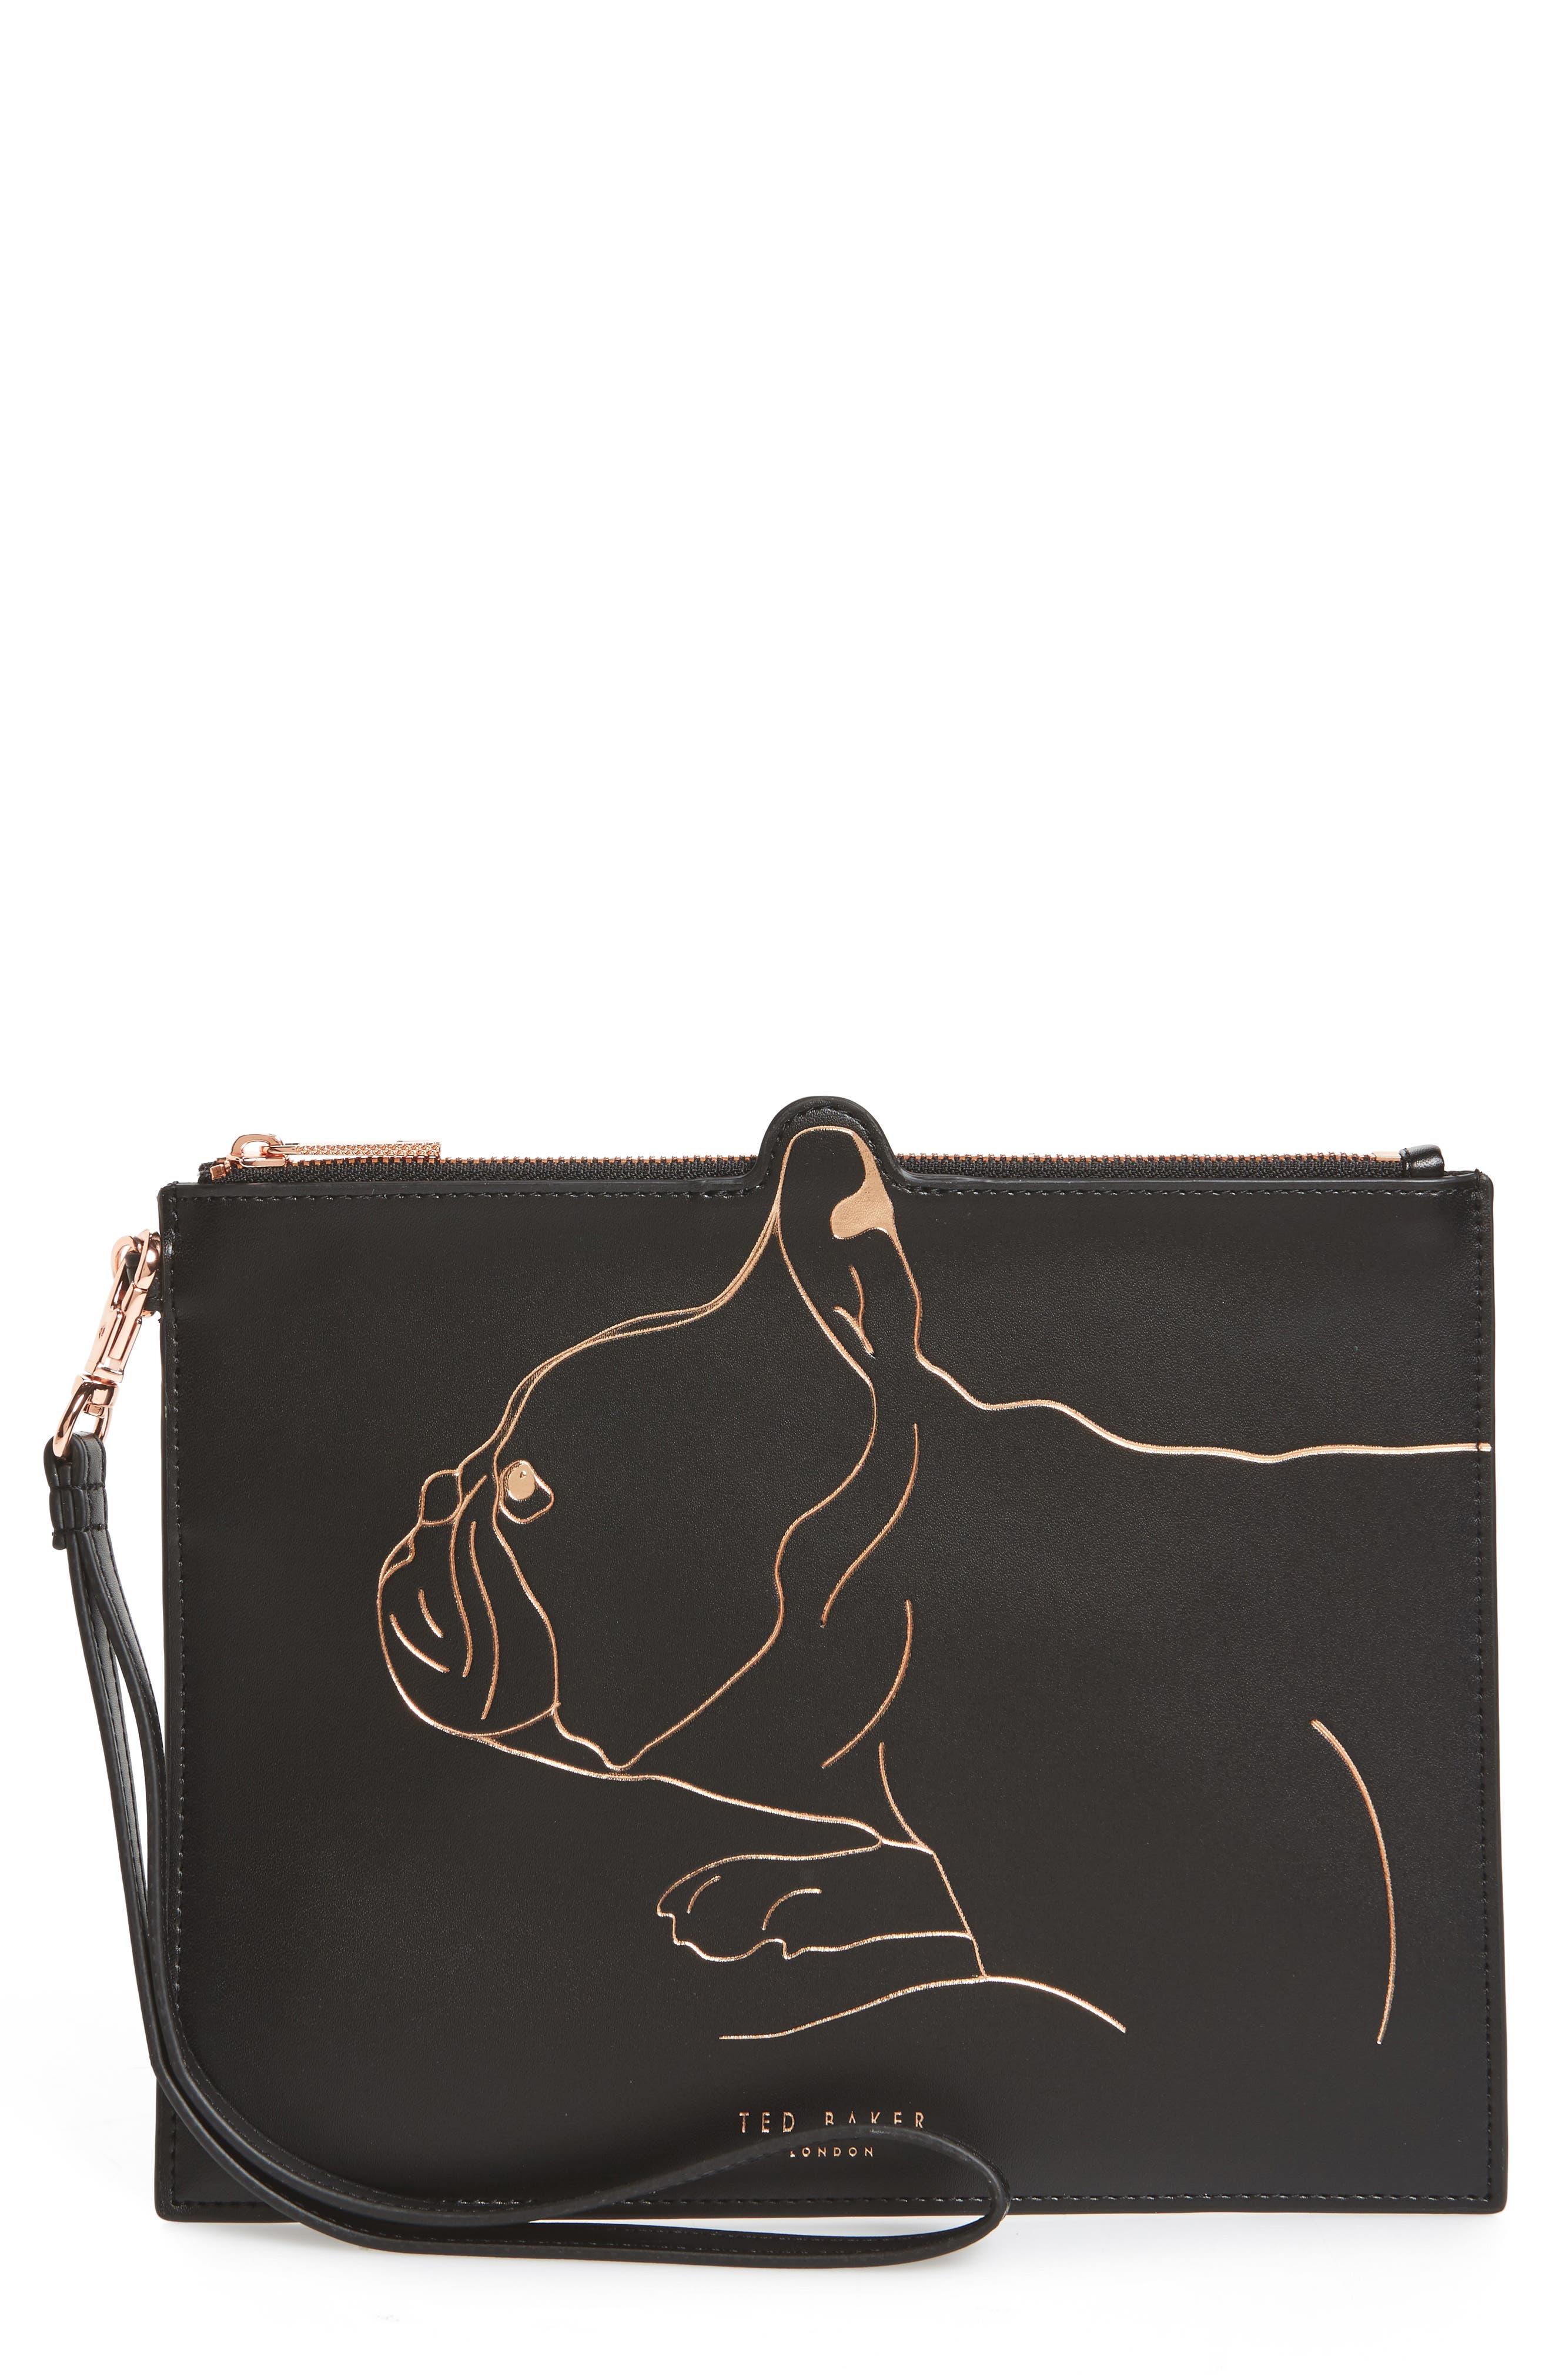 Barker Leather Pouch,                             Main thumbnail 1, color,                             Black